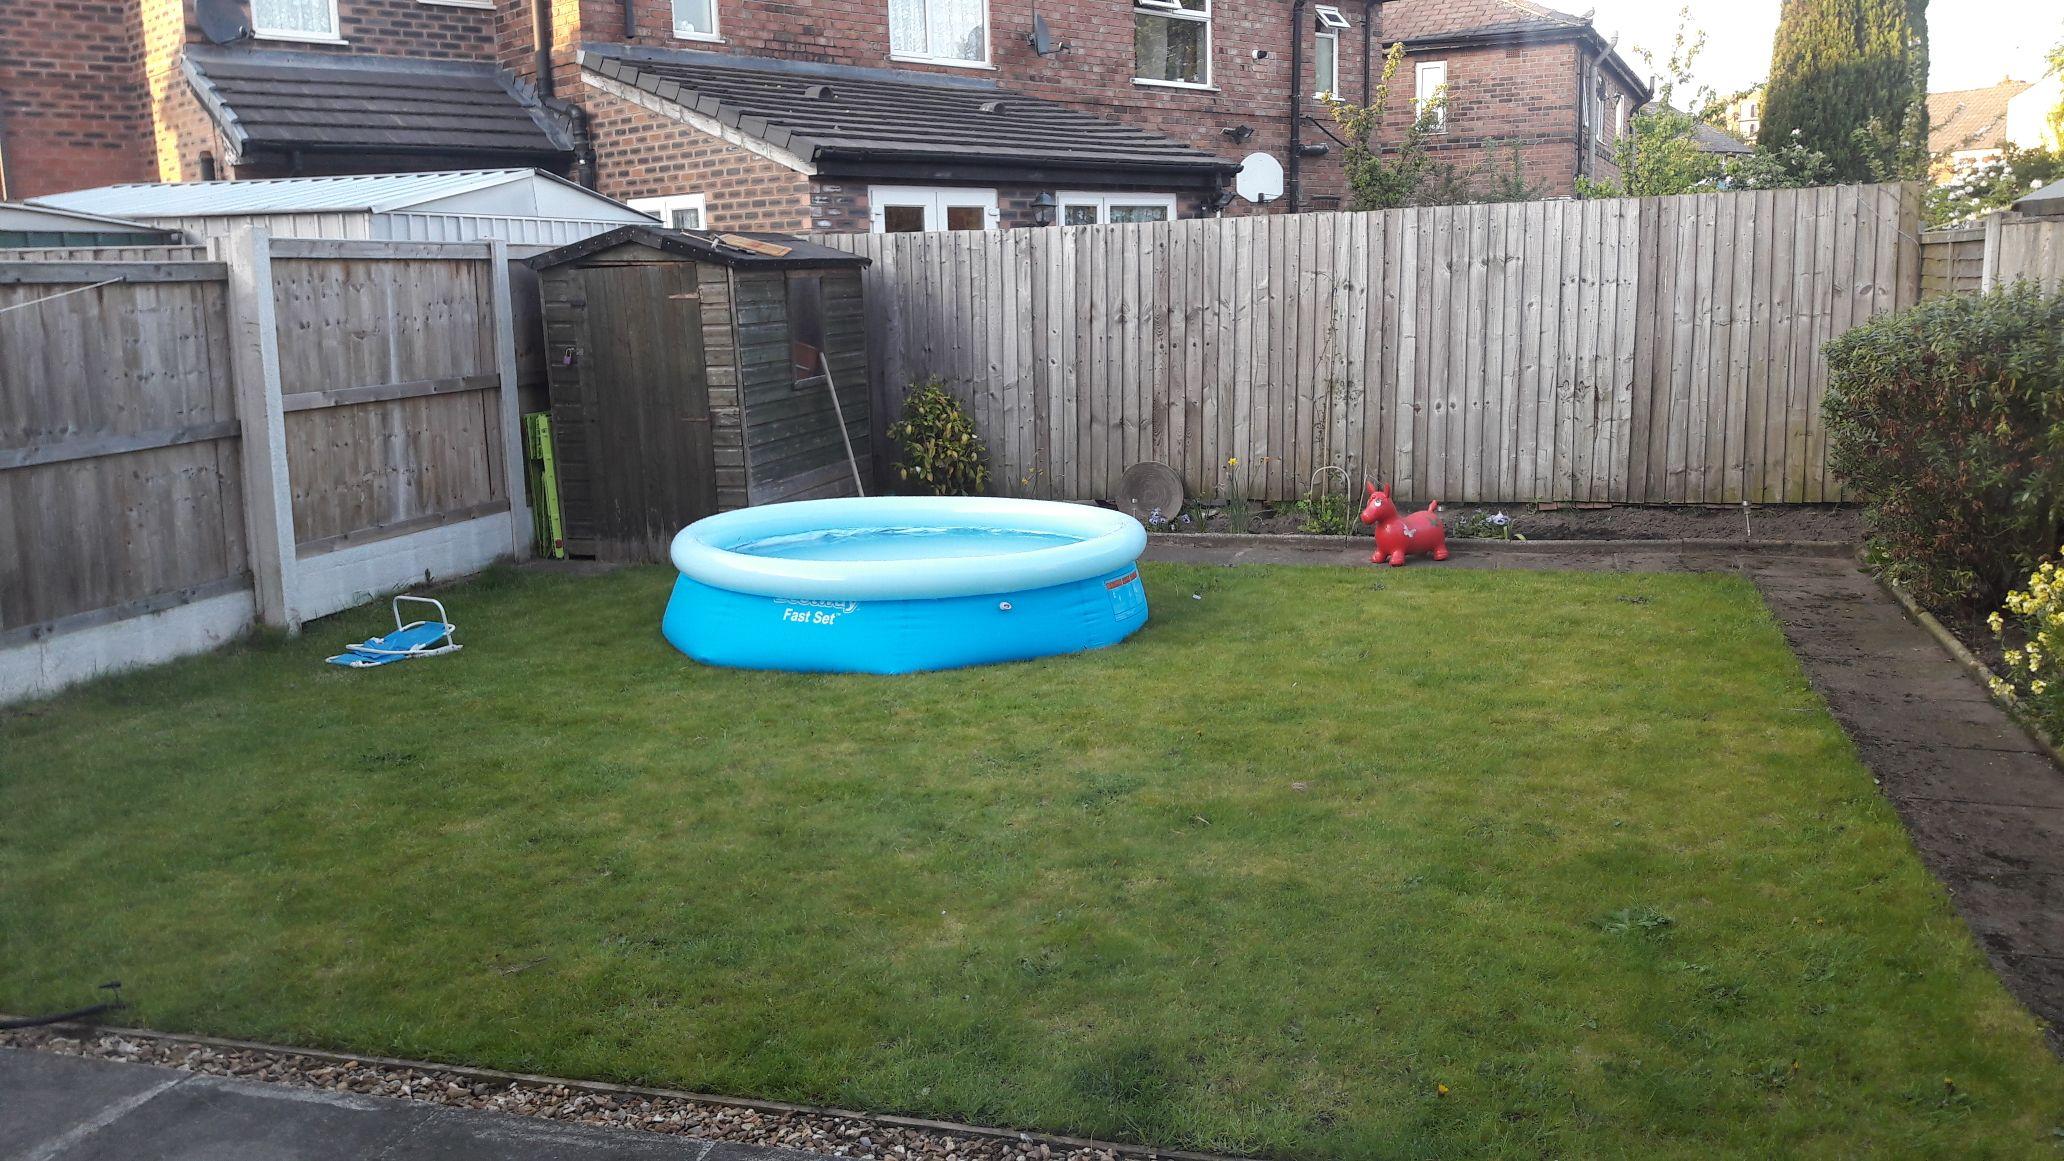 8ft paddling pool - £23.99 @ JTF online / instore